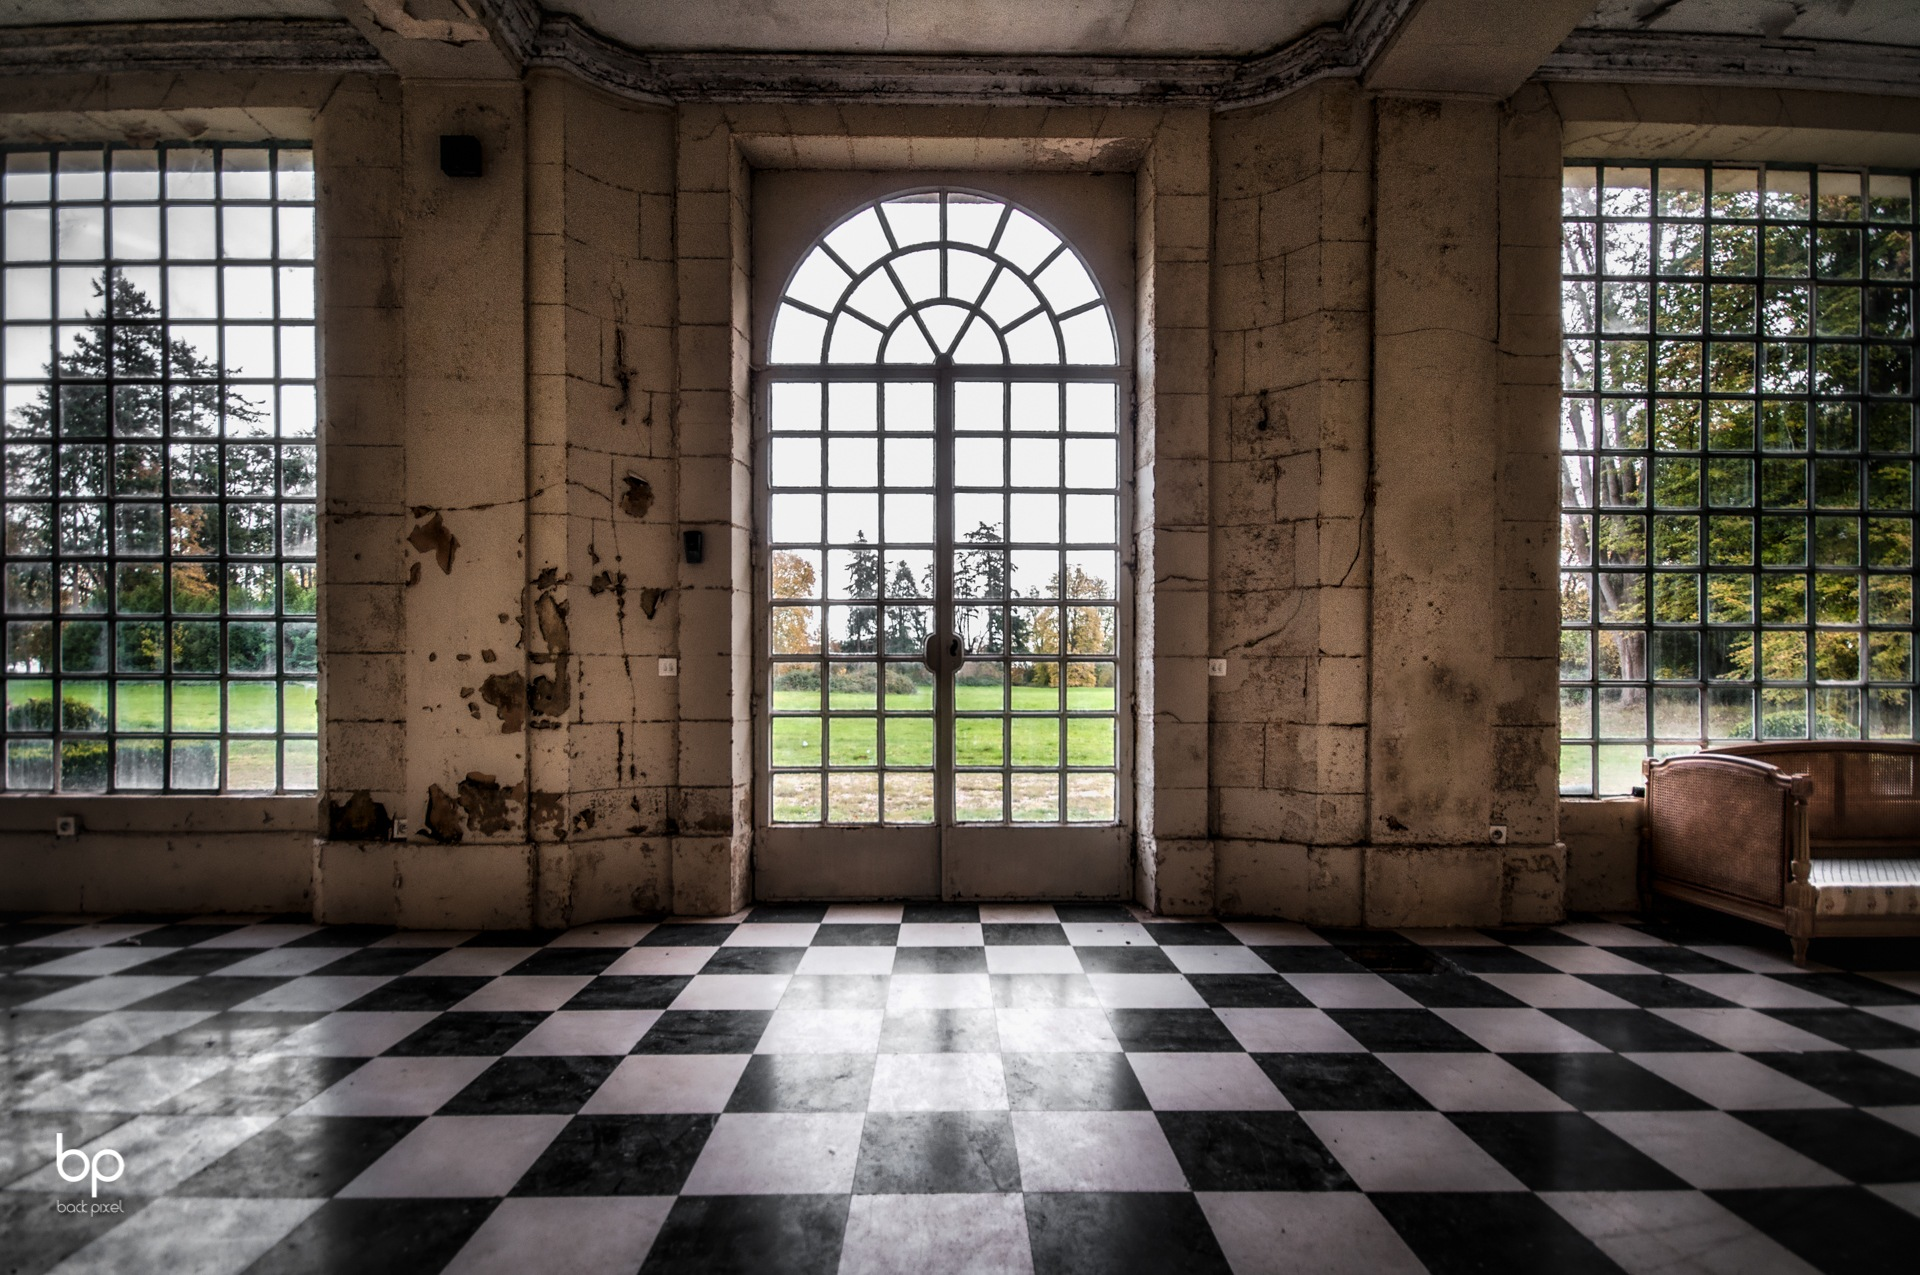 Entrance by BackPixel